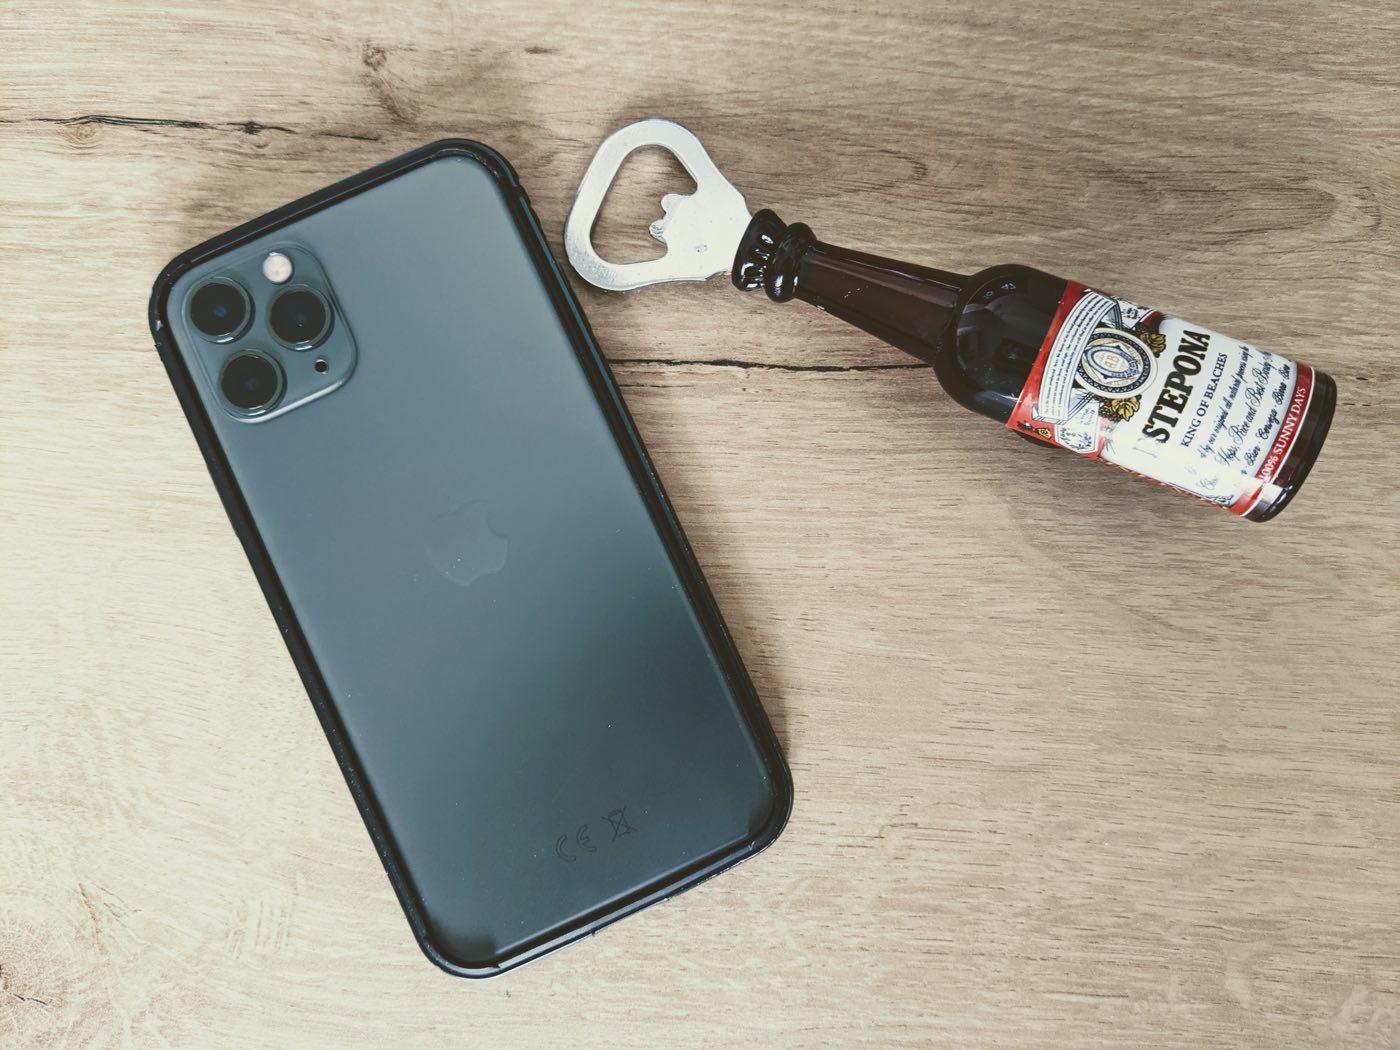 iphone saoul conduire